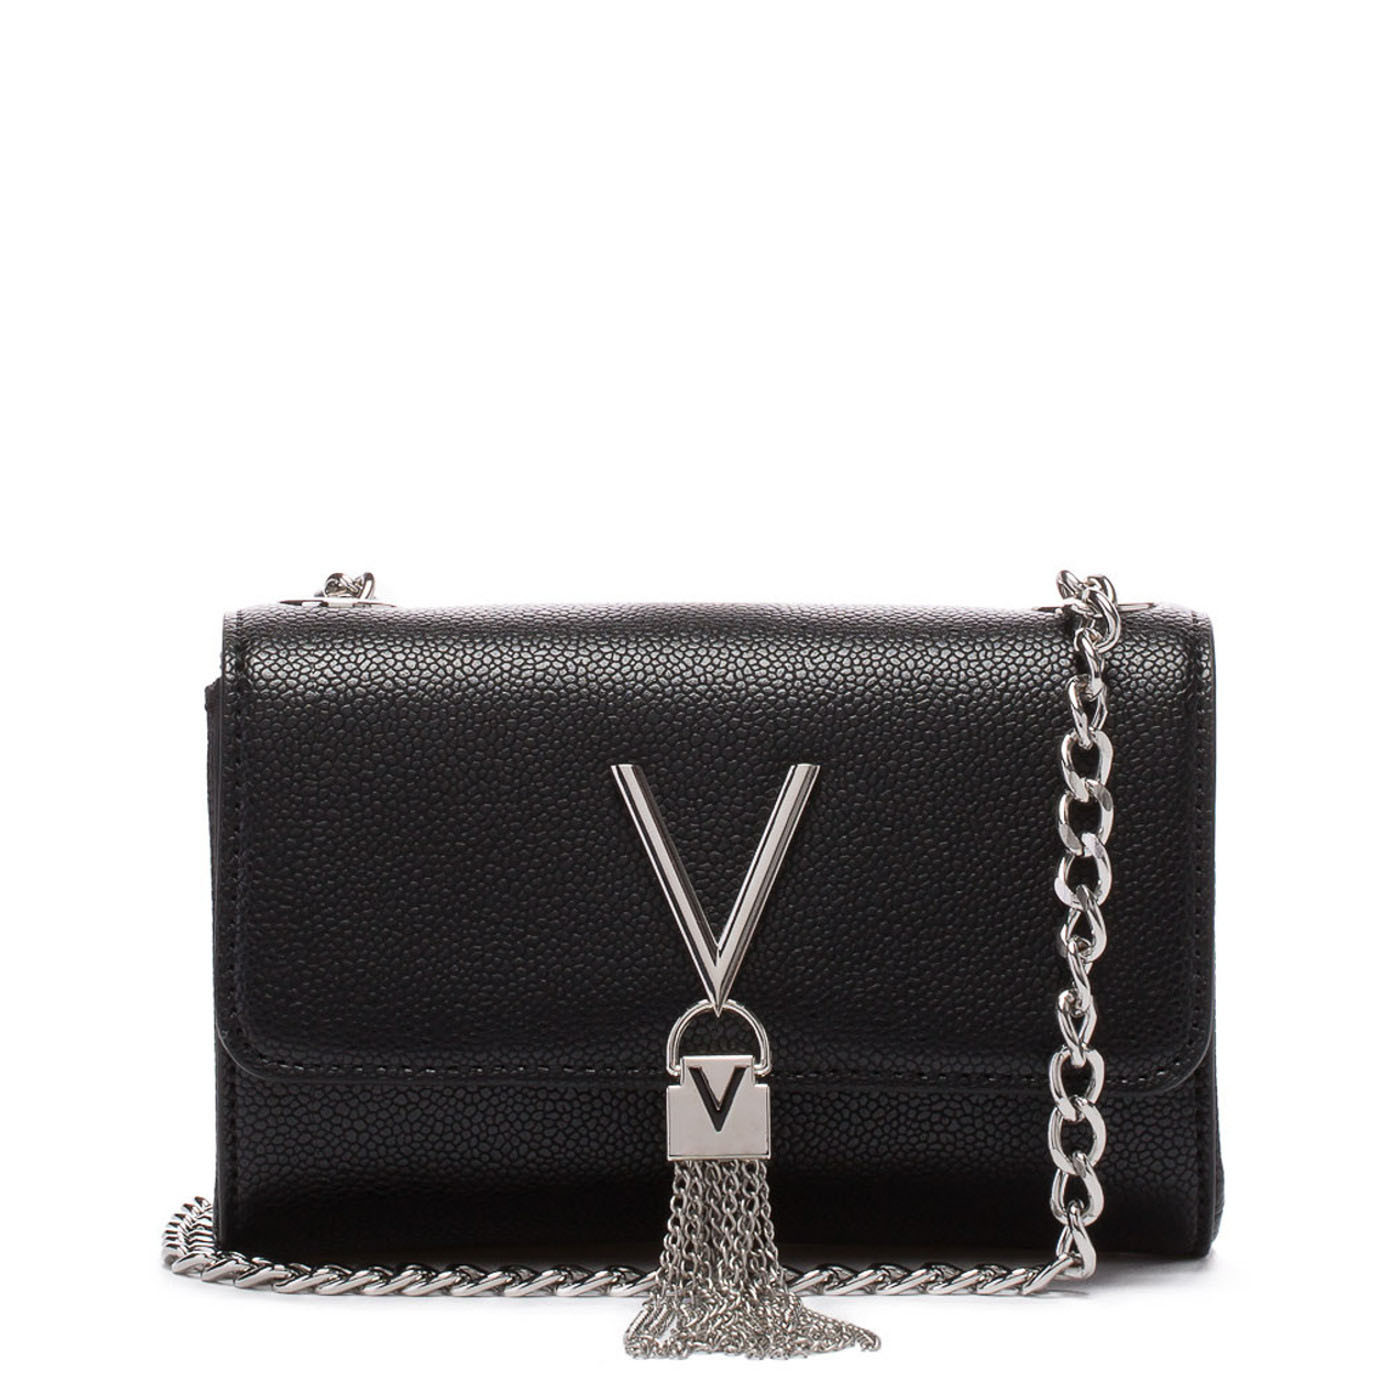 Valentino Divina taška s příčným popruhem VBS1R403GNERO